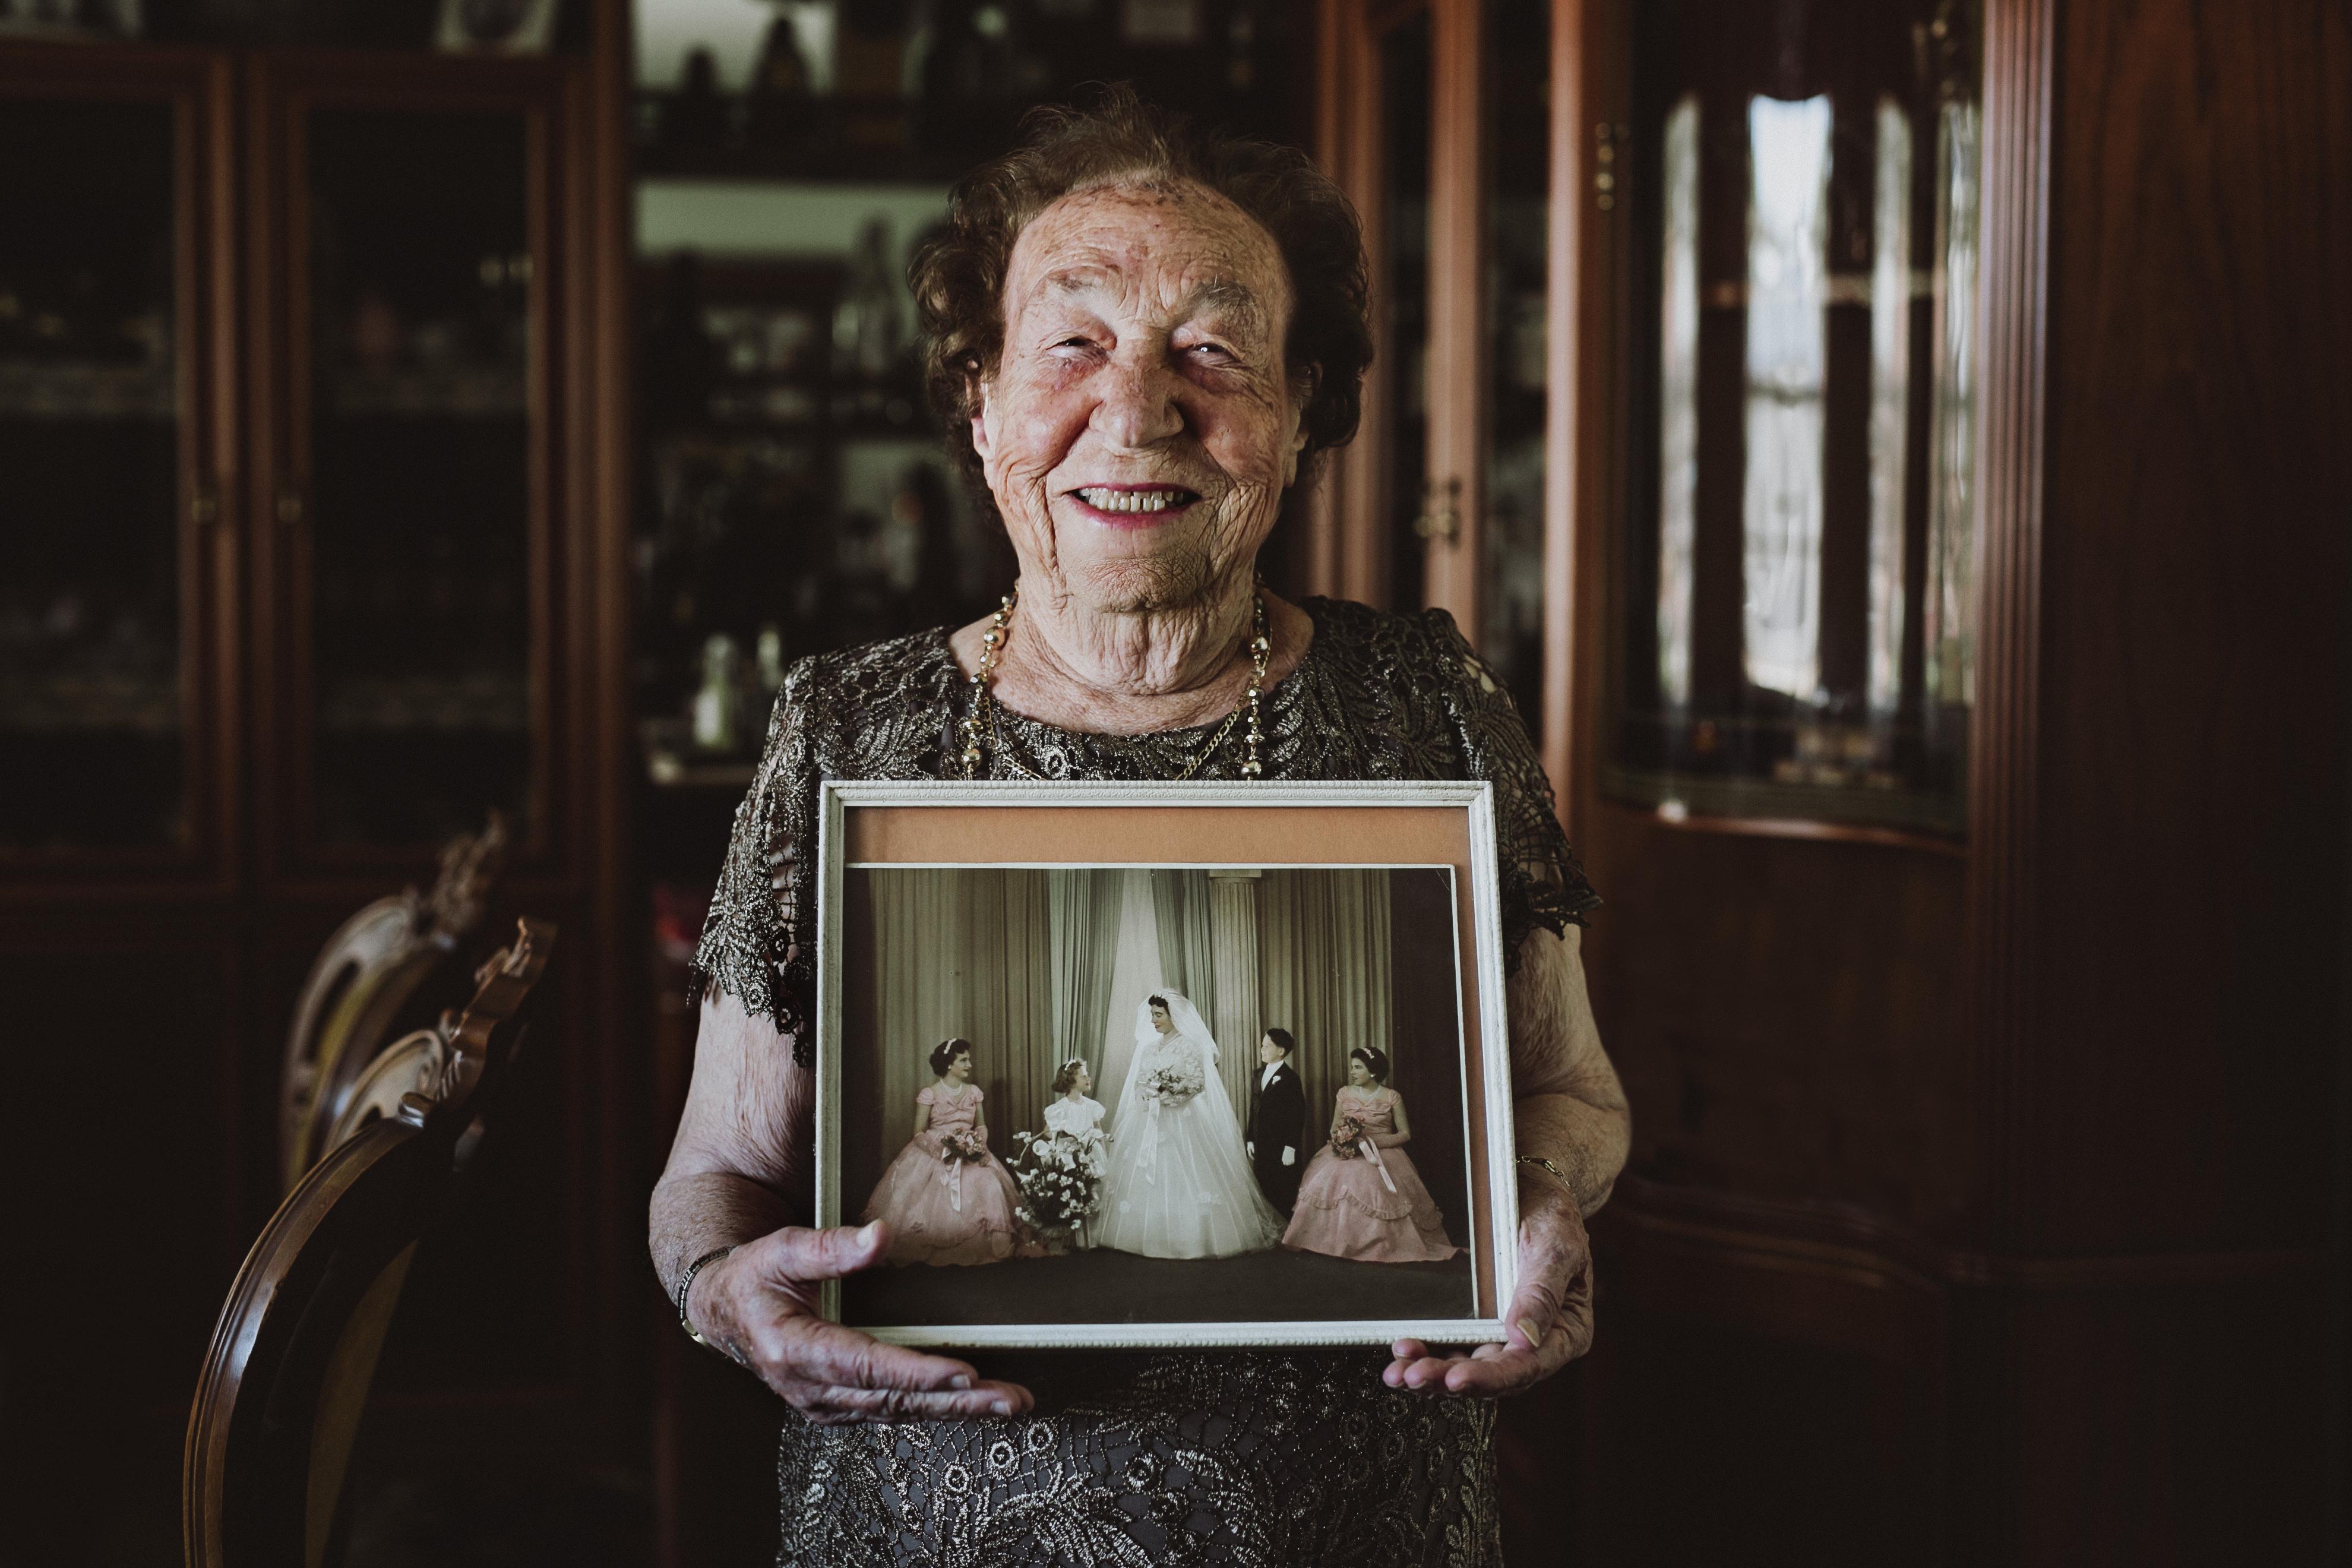 The lifetime joy of printed photos